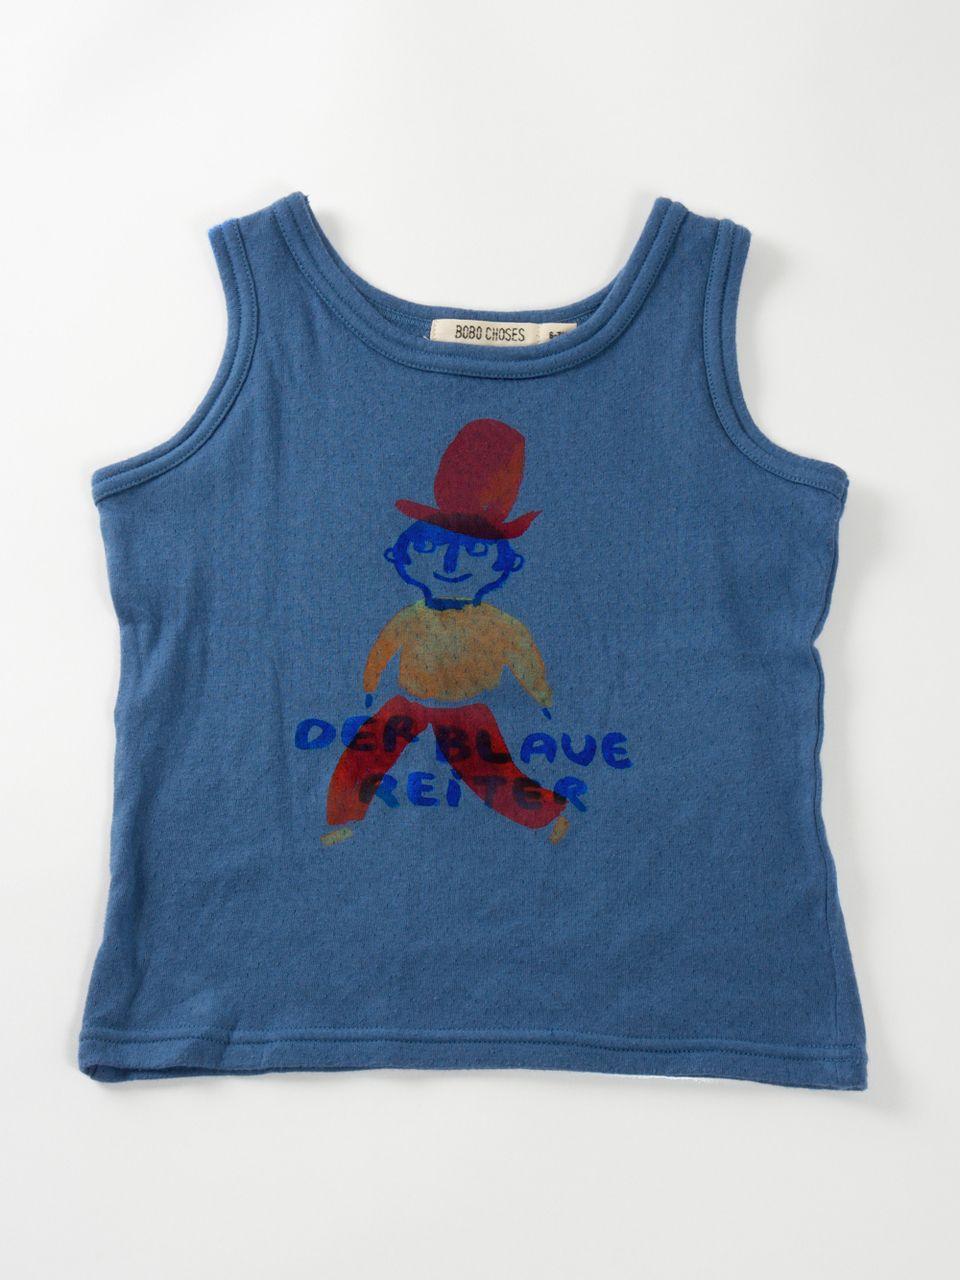 Bobo Choses Reiter Baby Tank   Cool Baby Clothes   Tiny Style   Australia